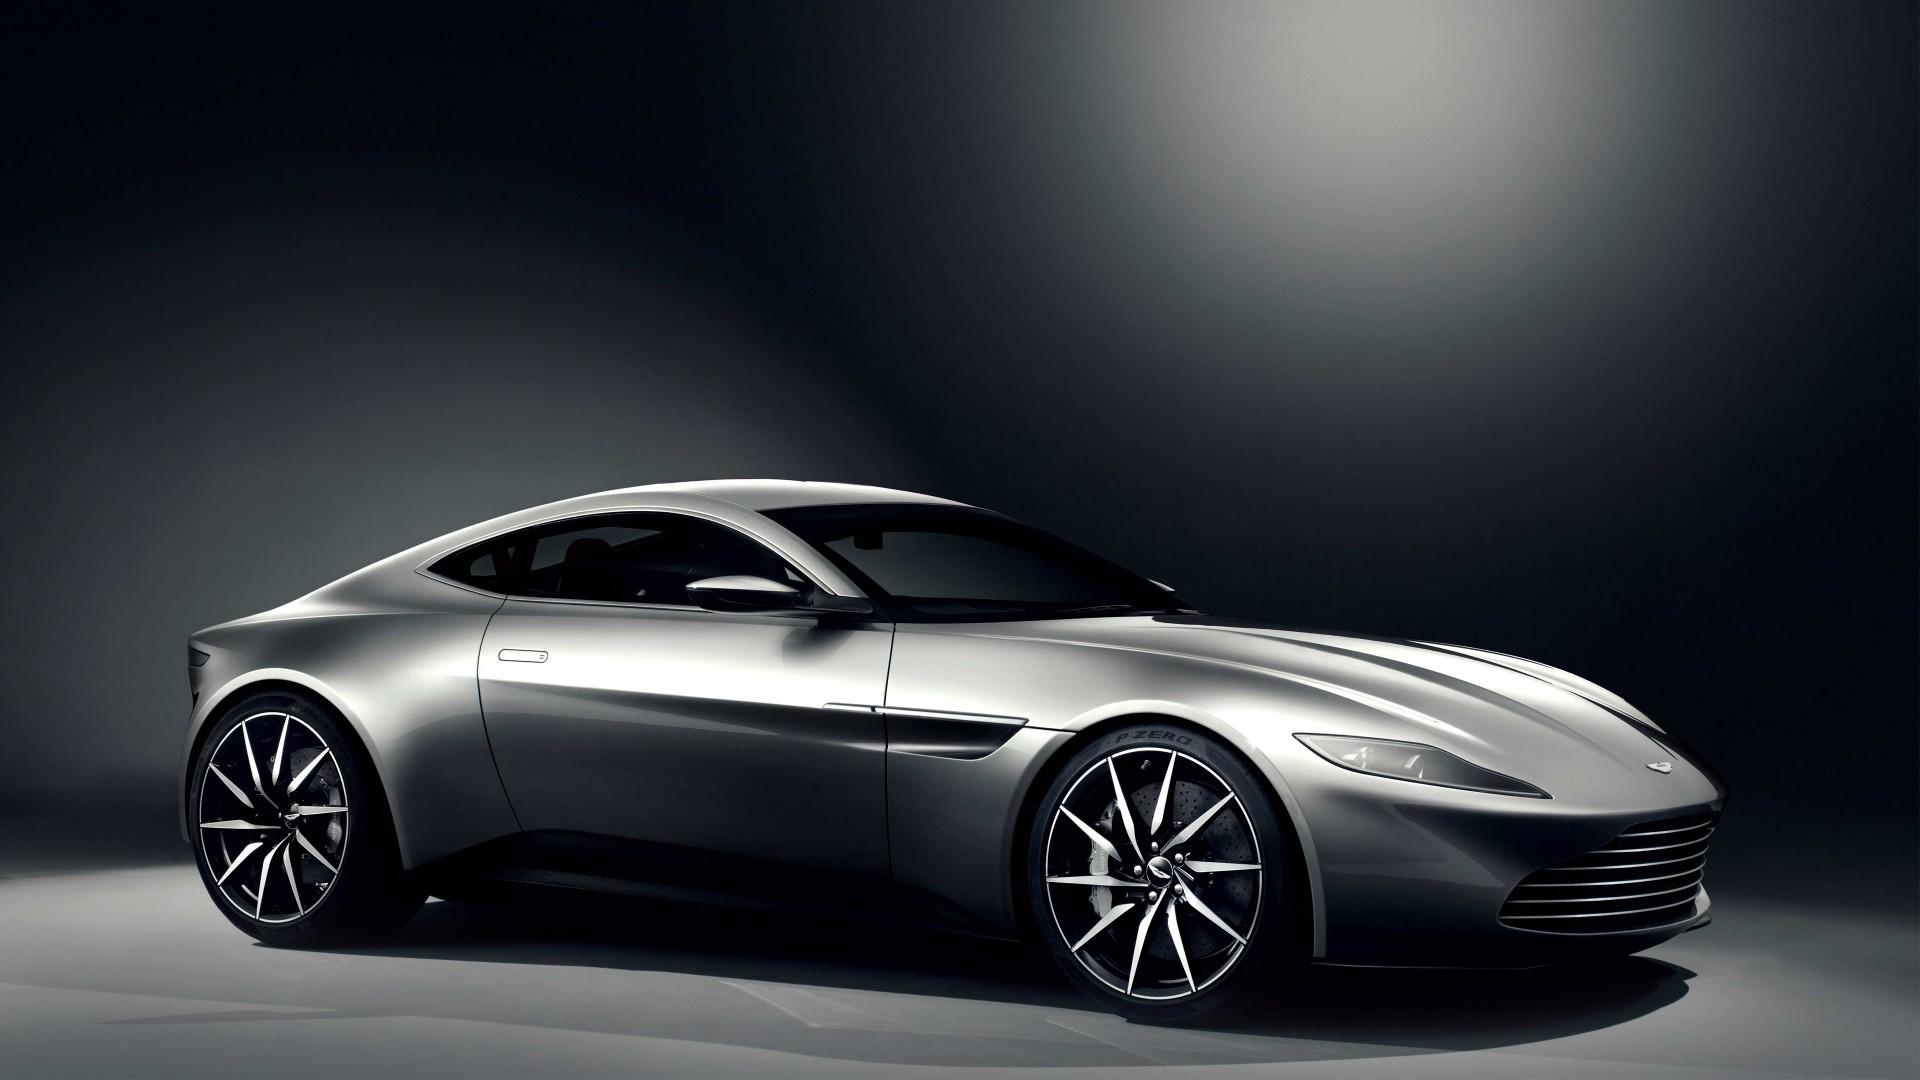 Mercedes Benz Logo >> Aston Martin DB10 4K Wallpaper | HD Car Wallpapers | ID #6010